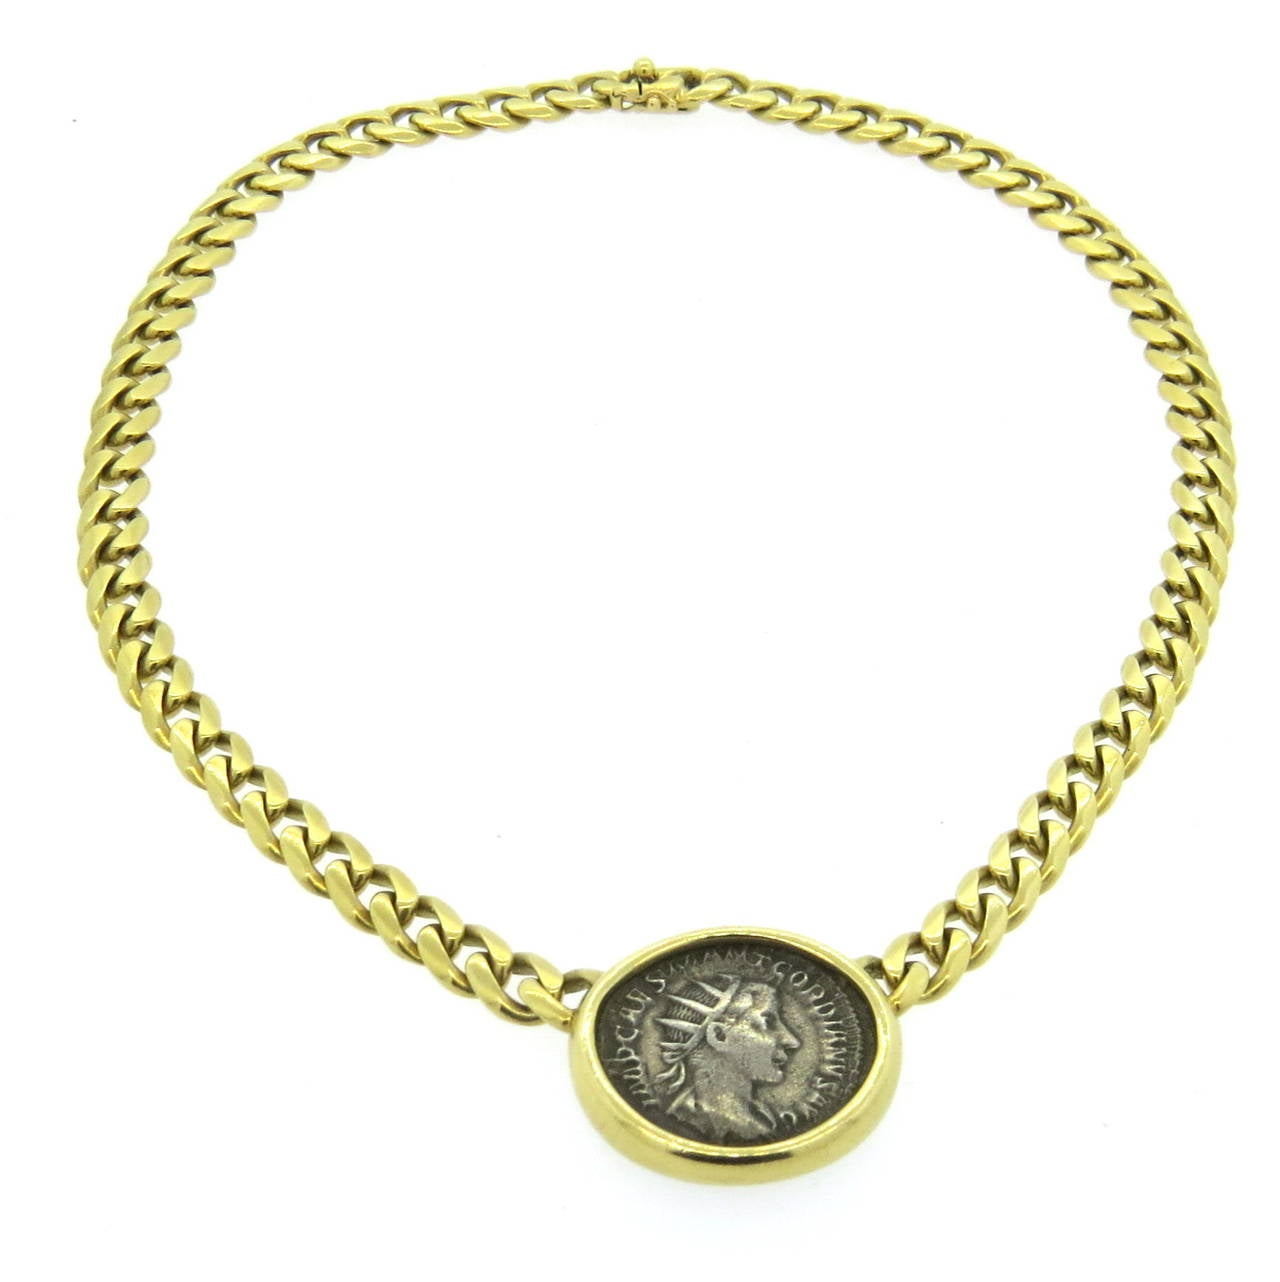 bulgari gold ancient coin necklace at 1stdibs